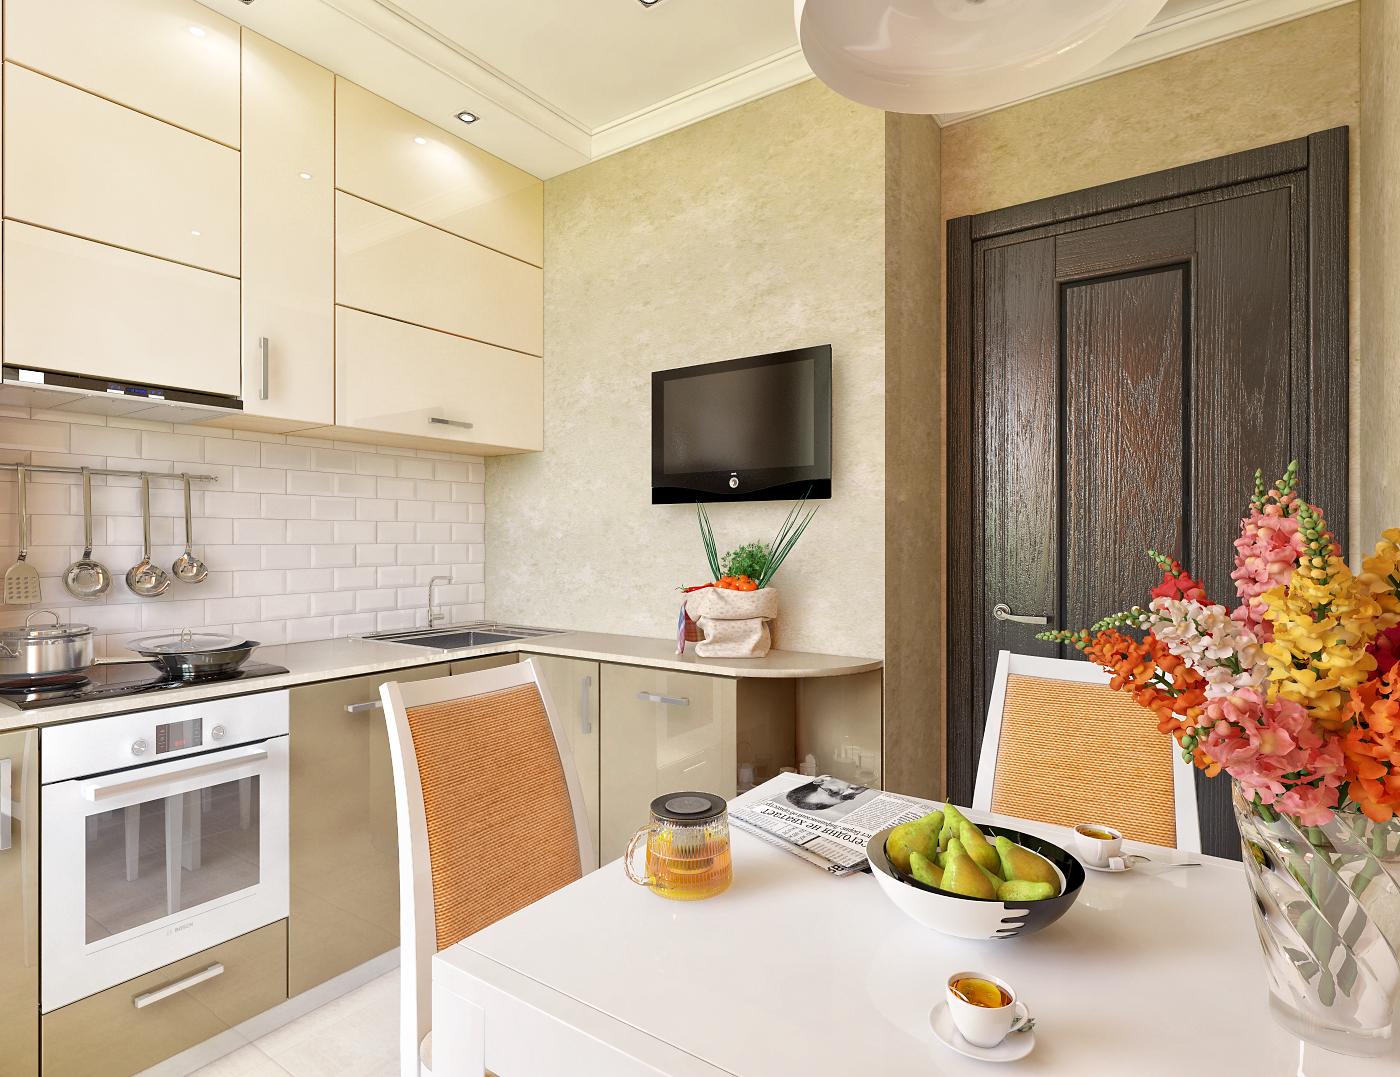 Дизайн кухни 11 кв м с балконом новинки 2016